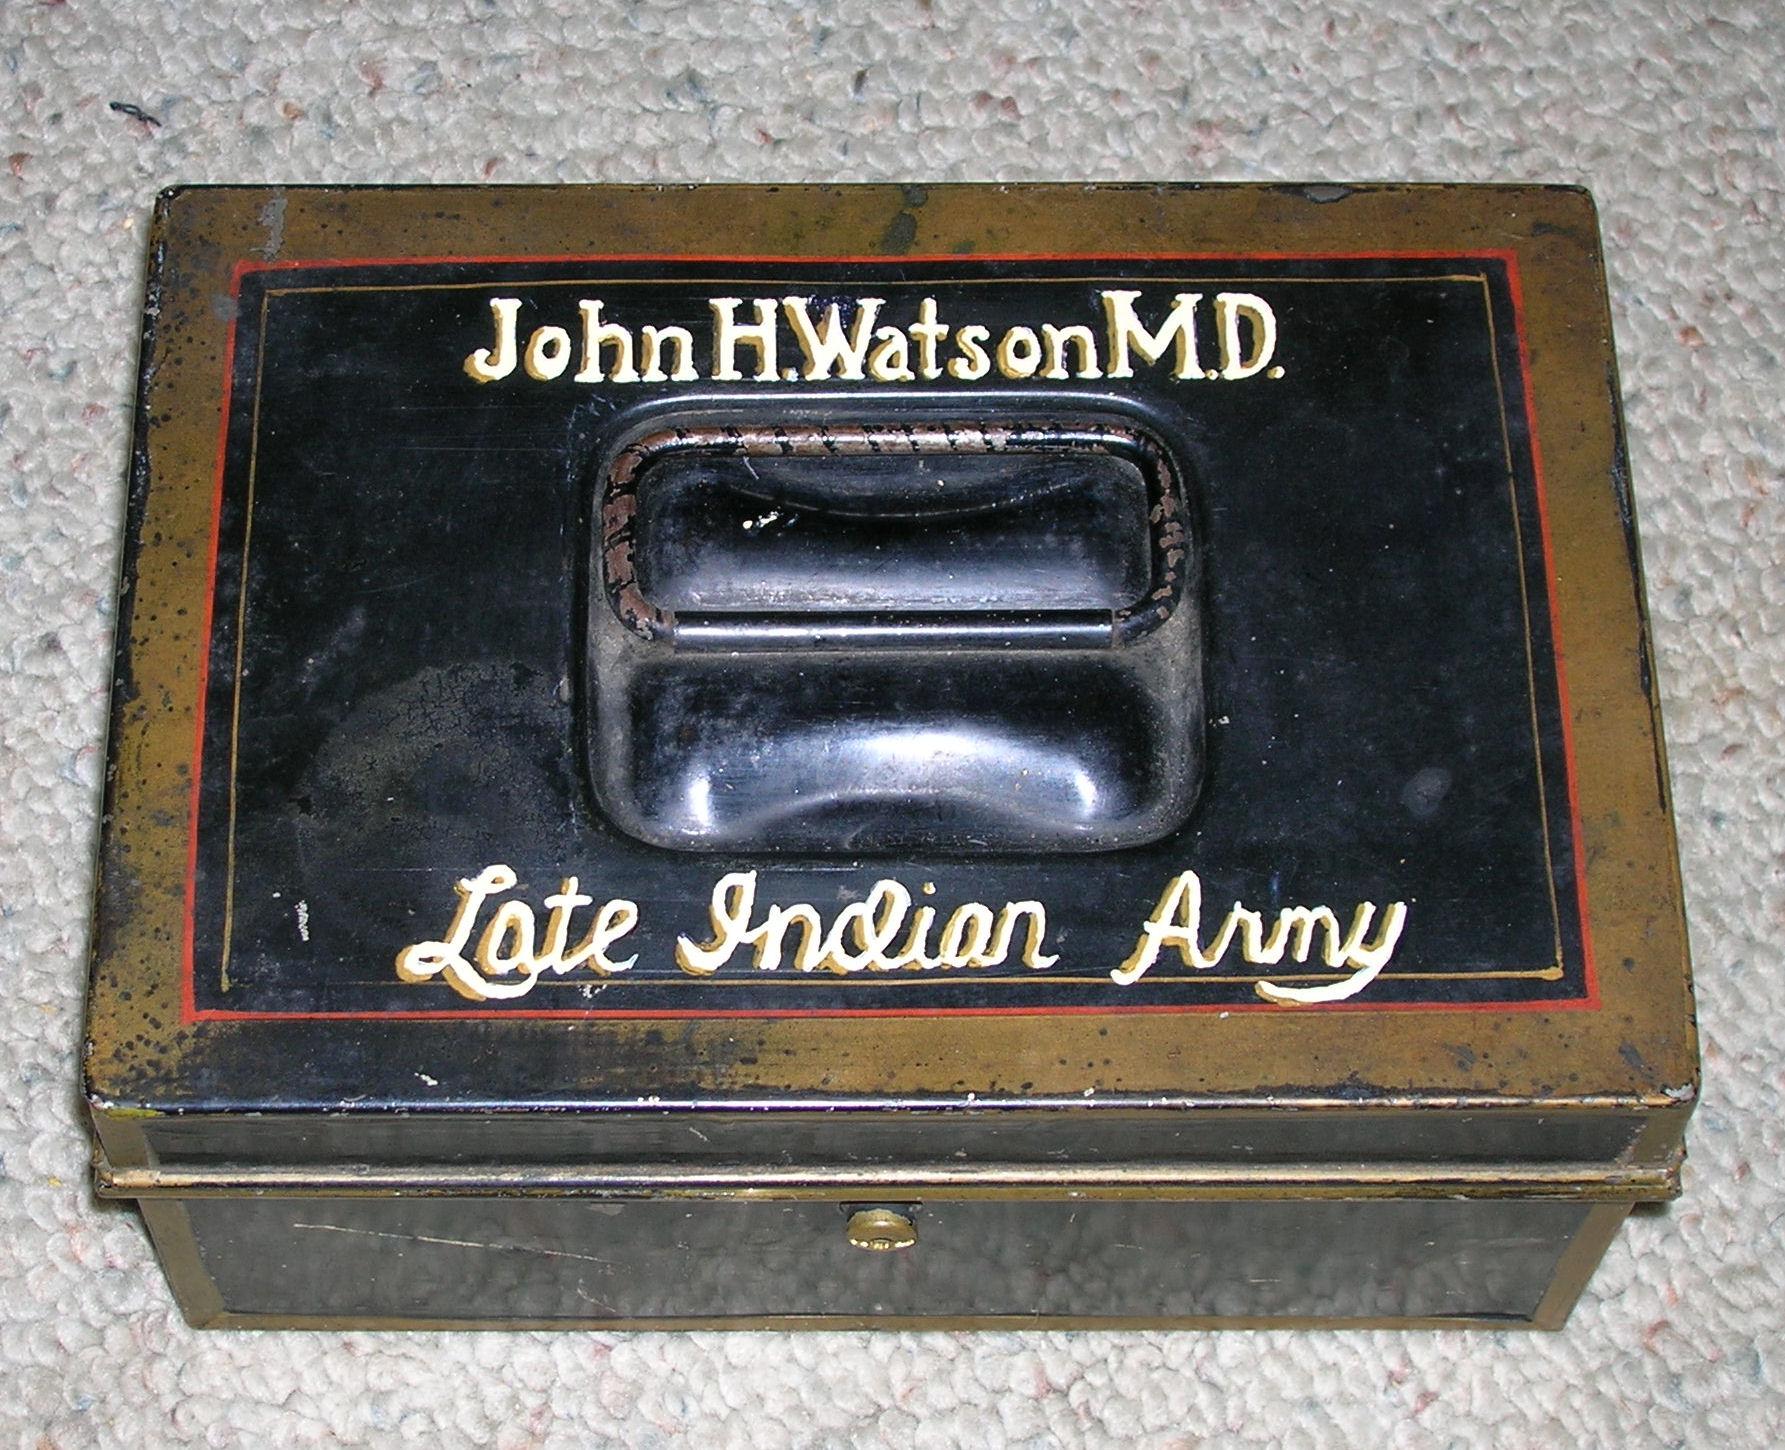 From Watson's Tin Box: The Silver Blaze